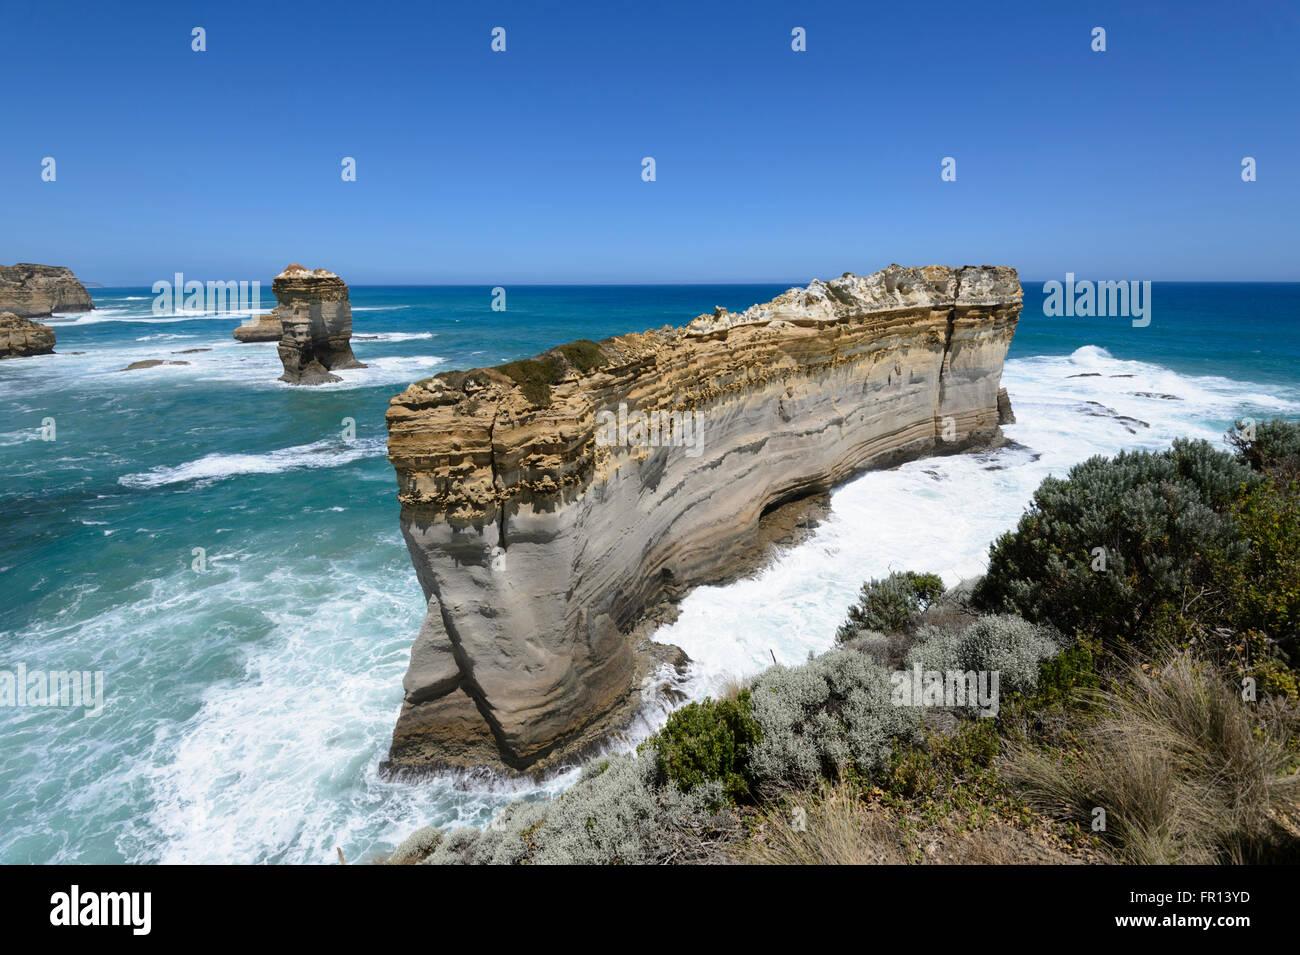 Le Razorback, Great Ocean Road, Victoria, Victoria, Australie Photo Stock